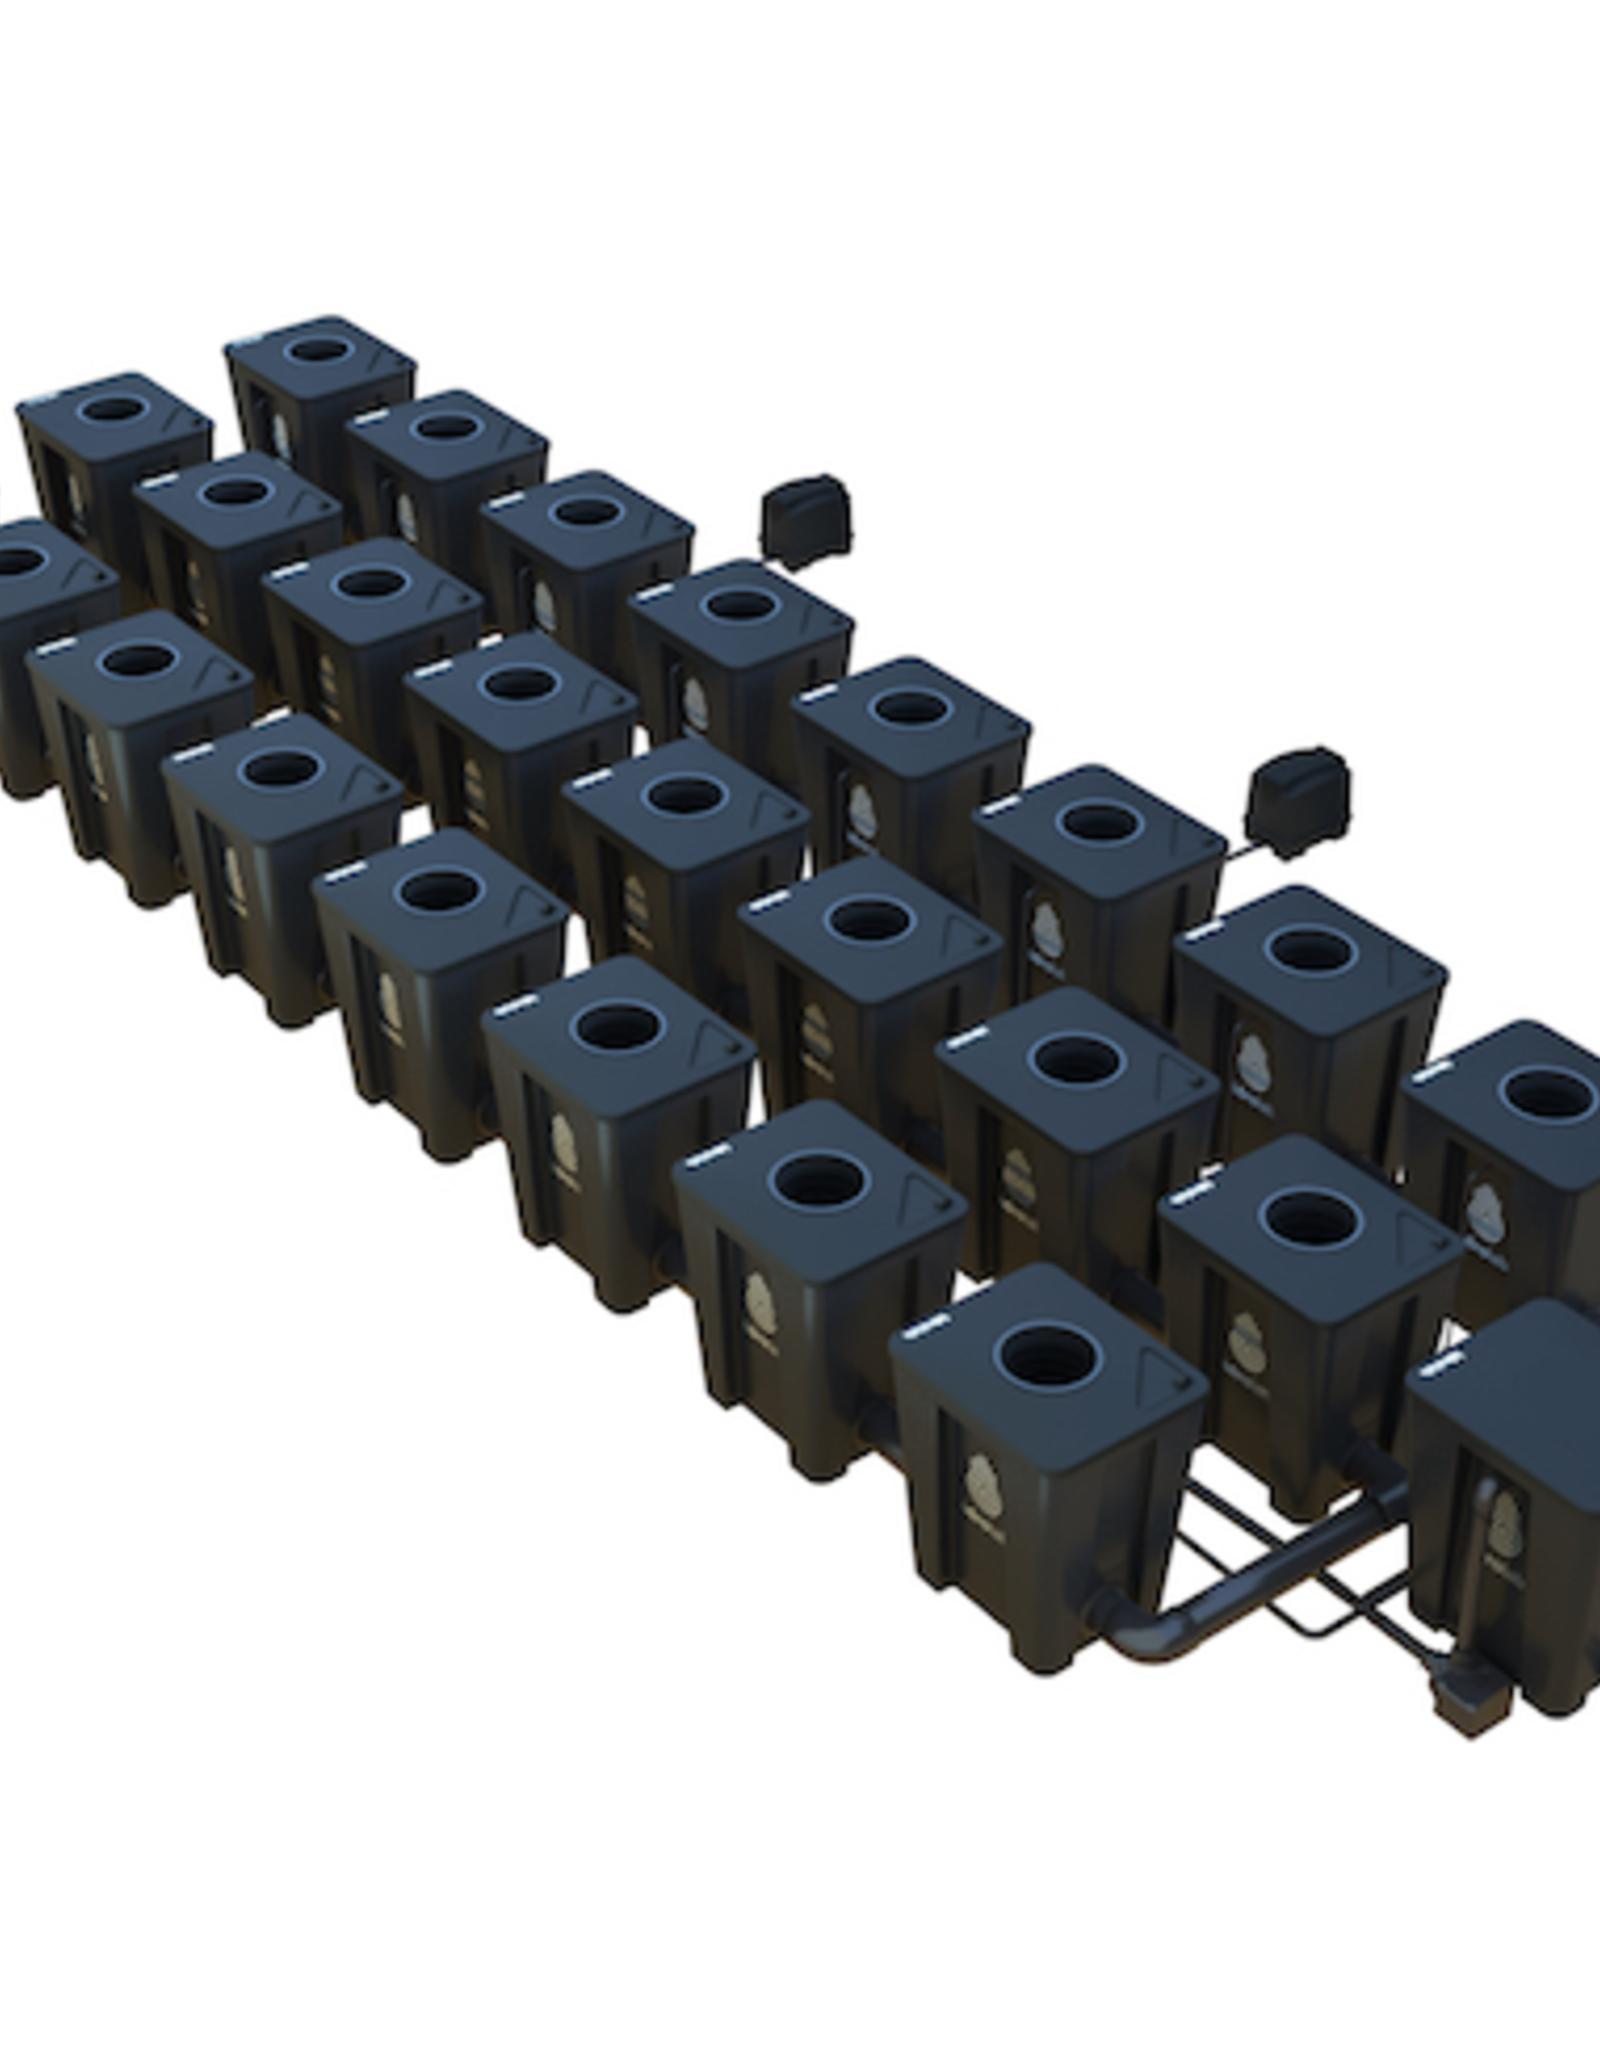 IDROLAB IDROLAB RDWC SYSTEM 3 LARGE 24+1